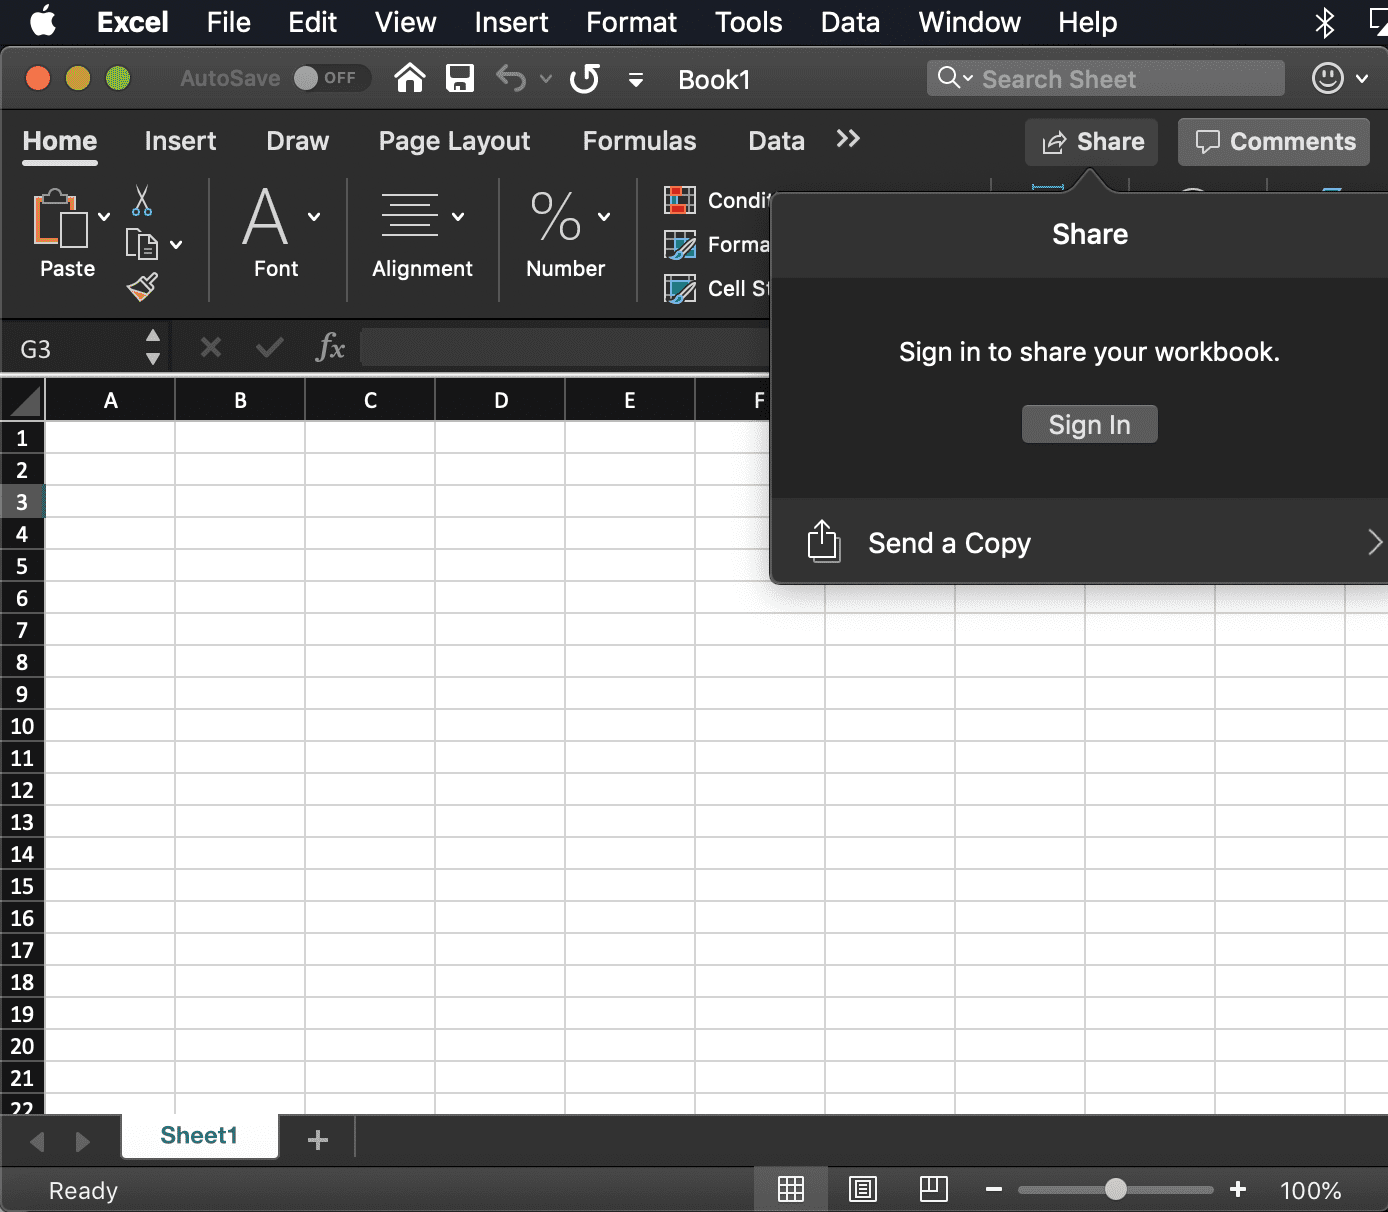 screenshot of the Excel Share dialog